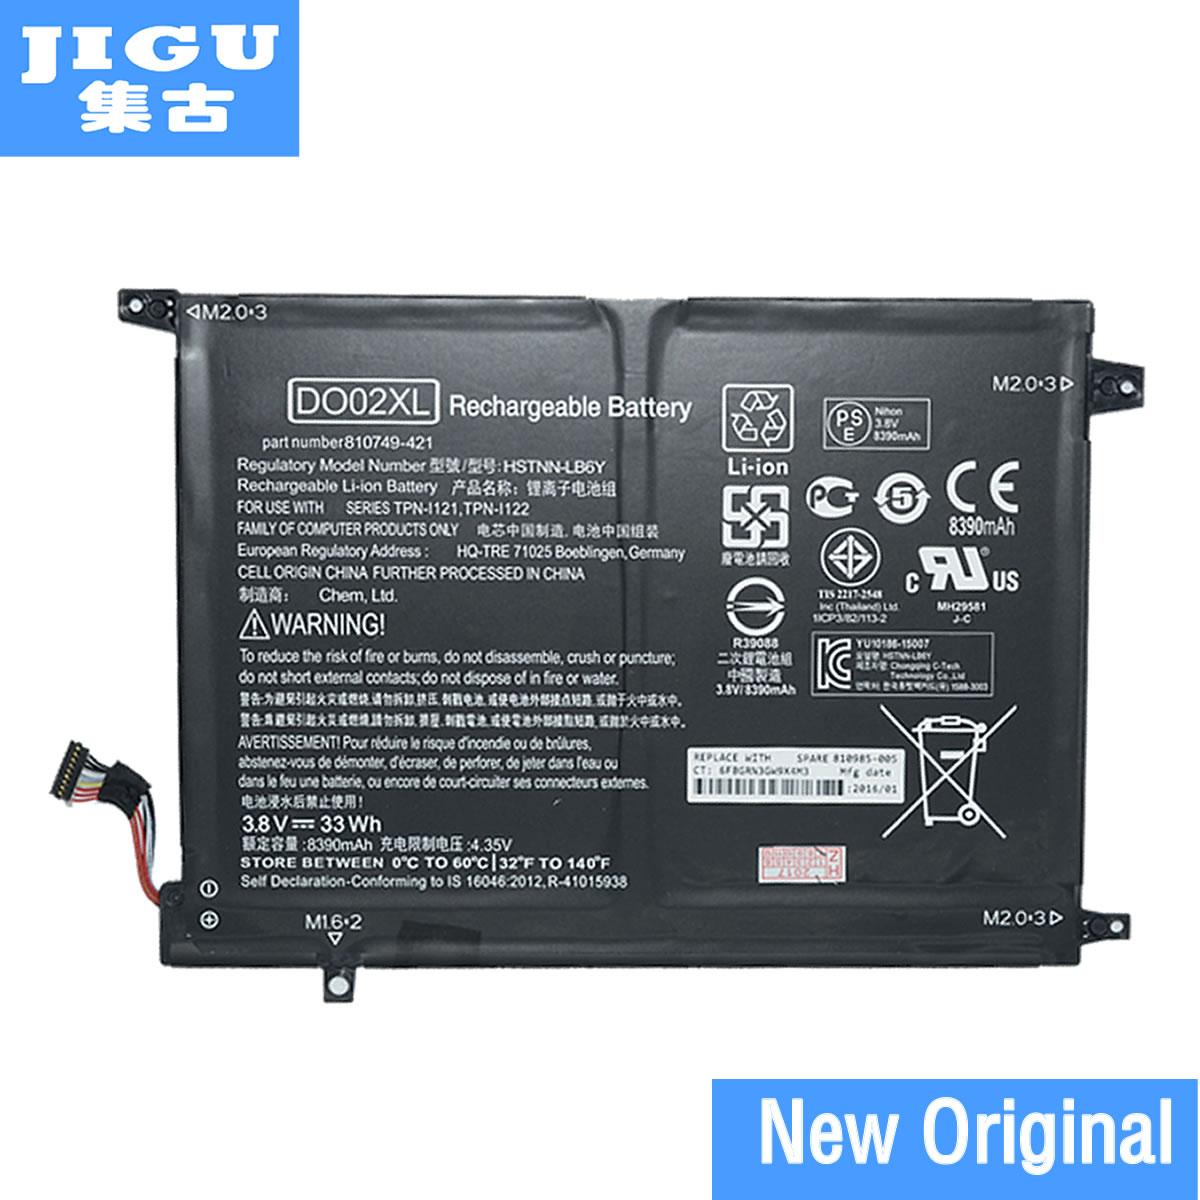 JIGU الأصلي بطارية كمبيوتر محمول 810749-421 810985-005 DO02XL HSTNN-LB6Y TPN-I121 TPN-I122 لإتش بي جناح x2 10